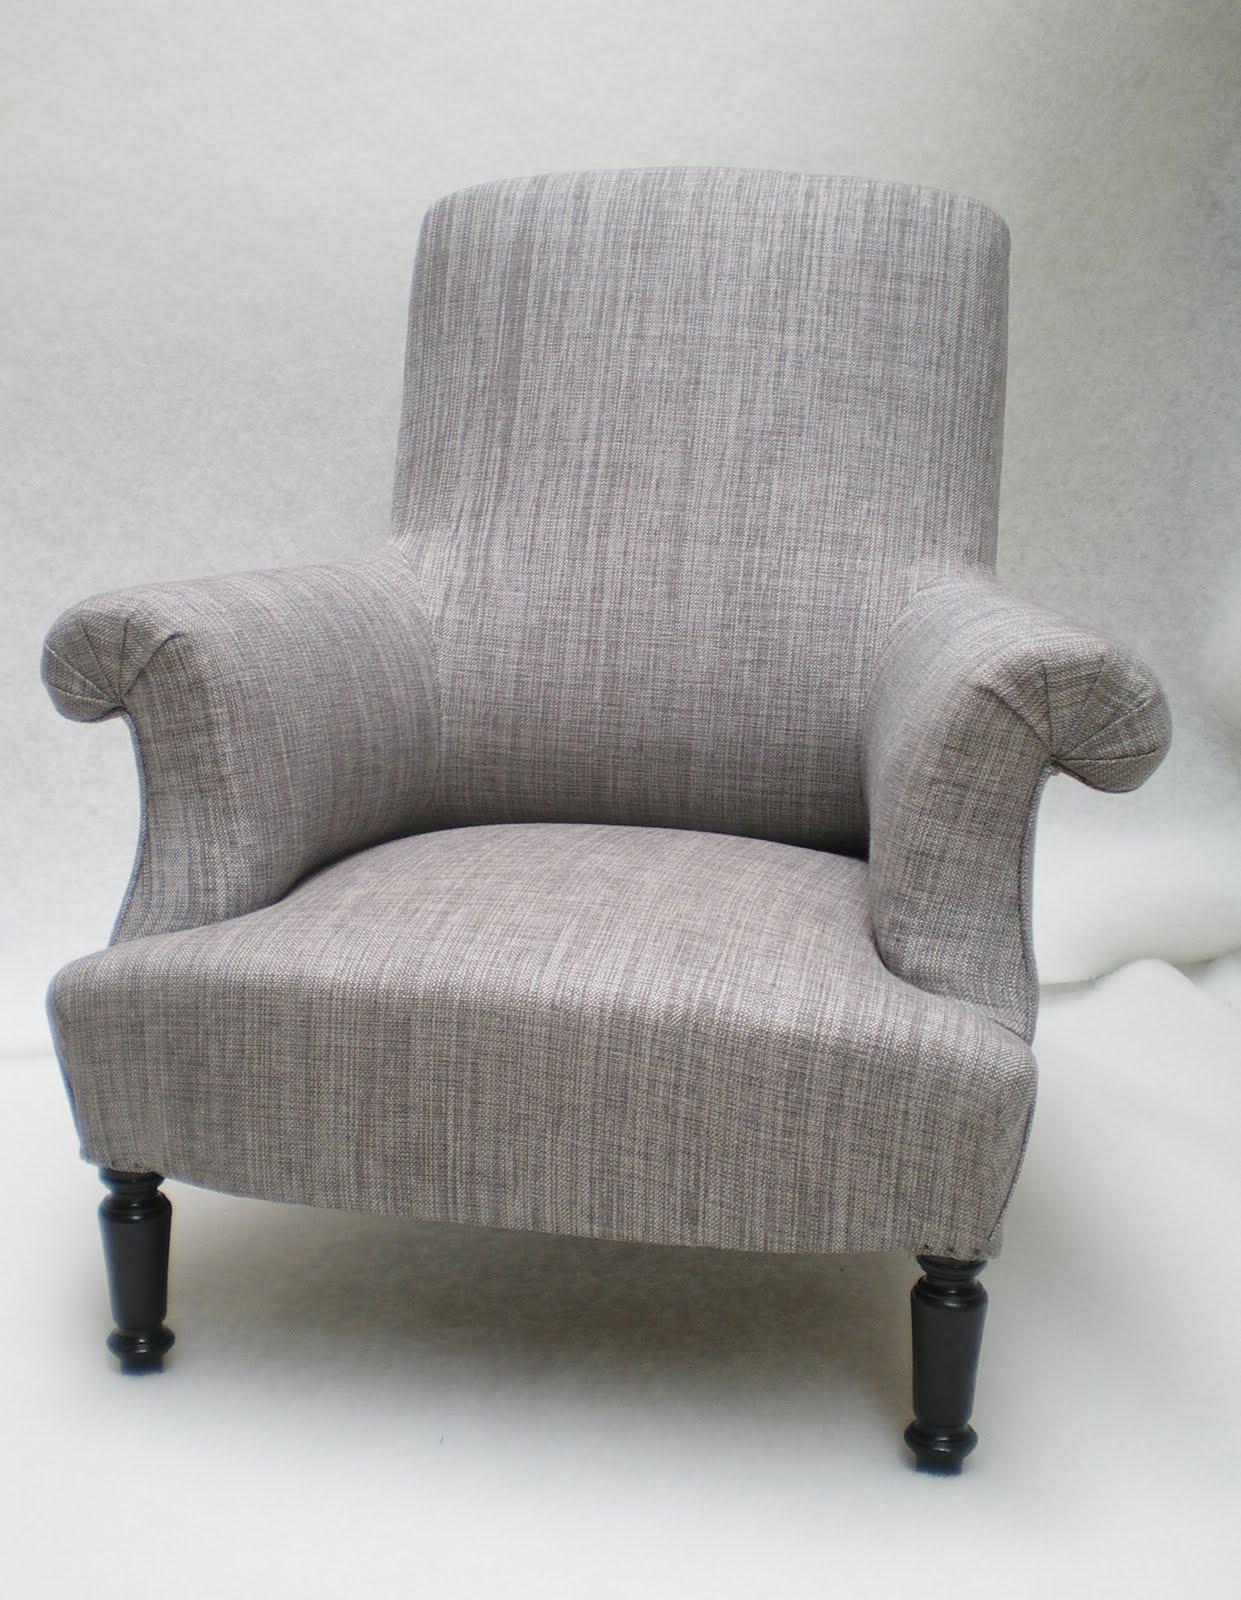 delphine cheignon le fauteuil anglais. Black Bedroom Furniture Sets. Home Design Ideas